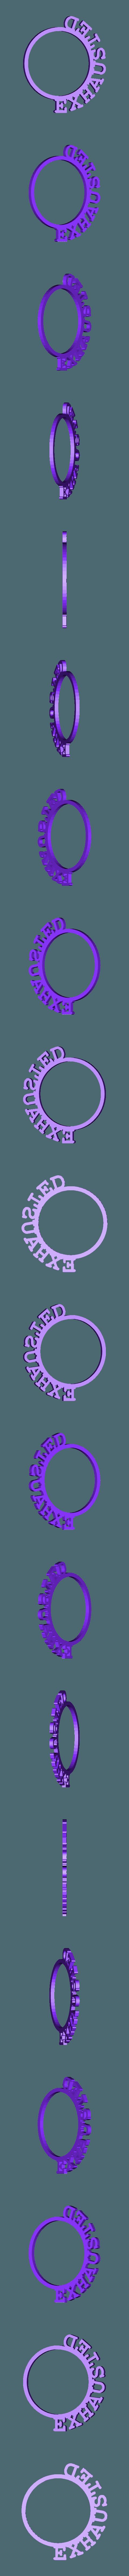 LRingExhausted.stl Download STL file D&D Condition Rings • 3D printable design, Jinja